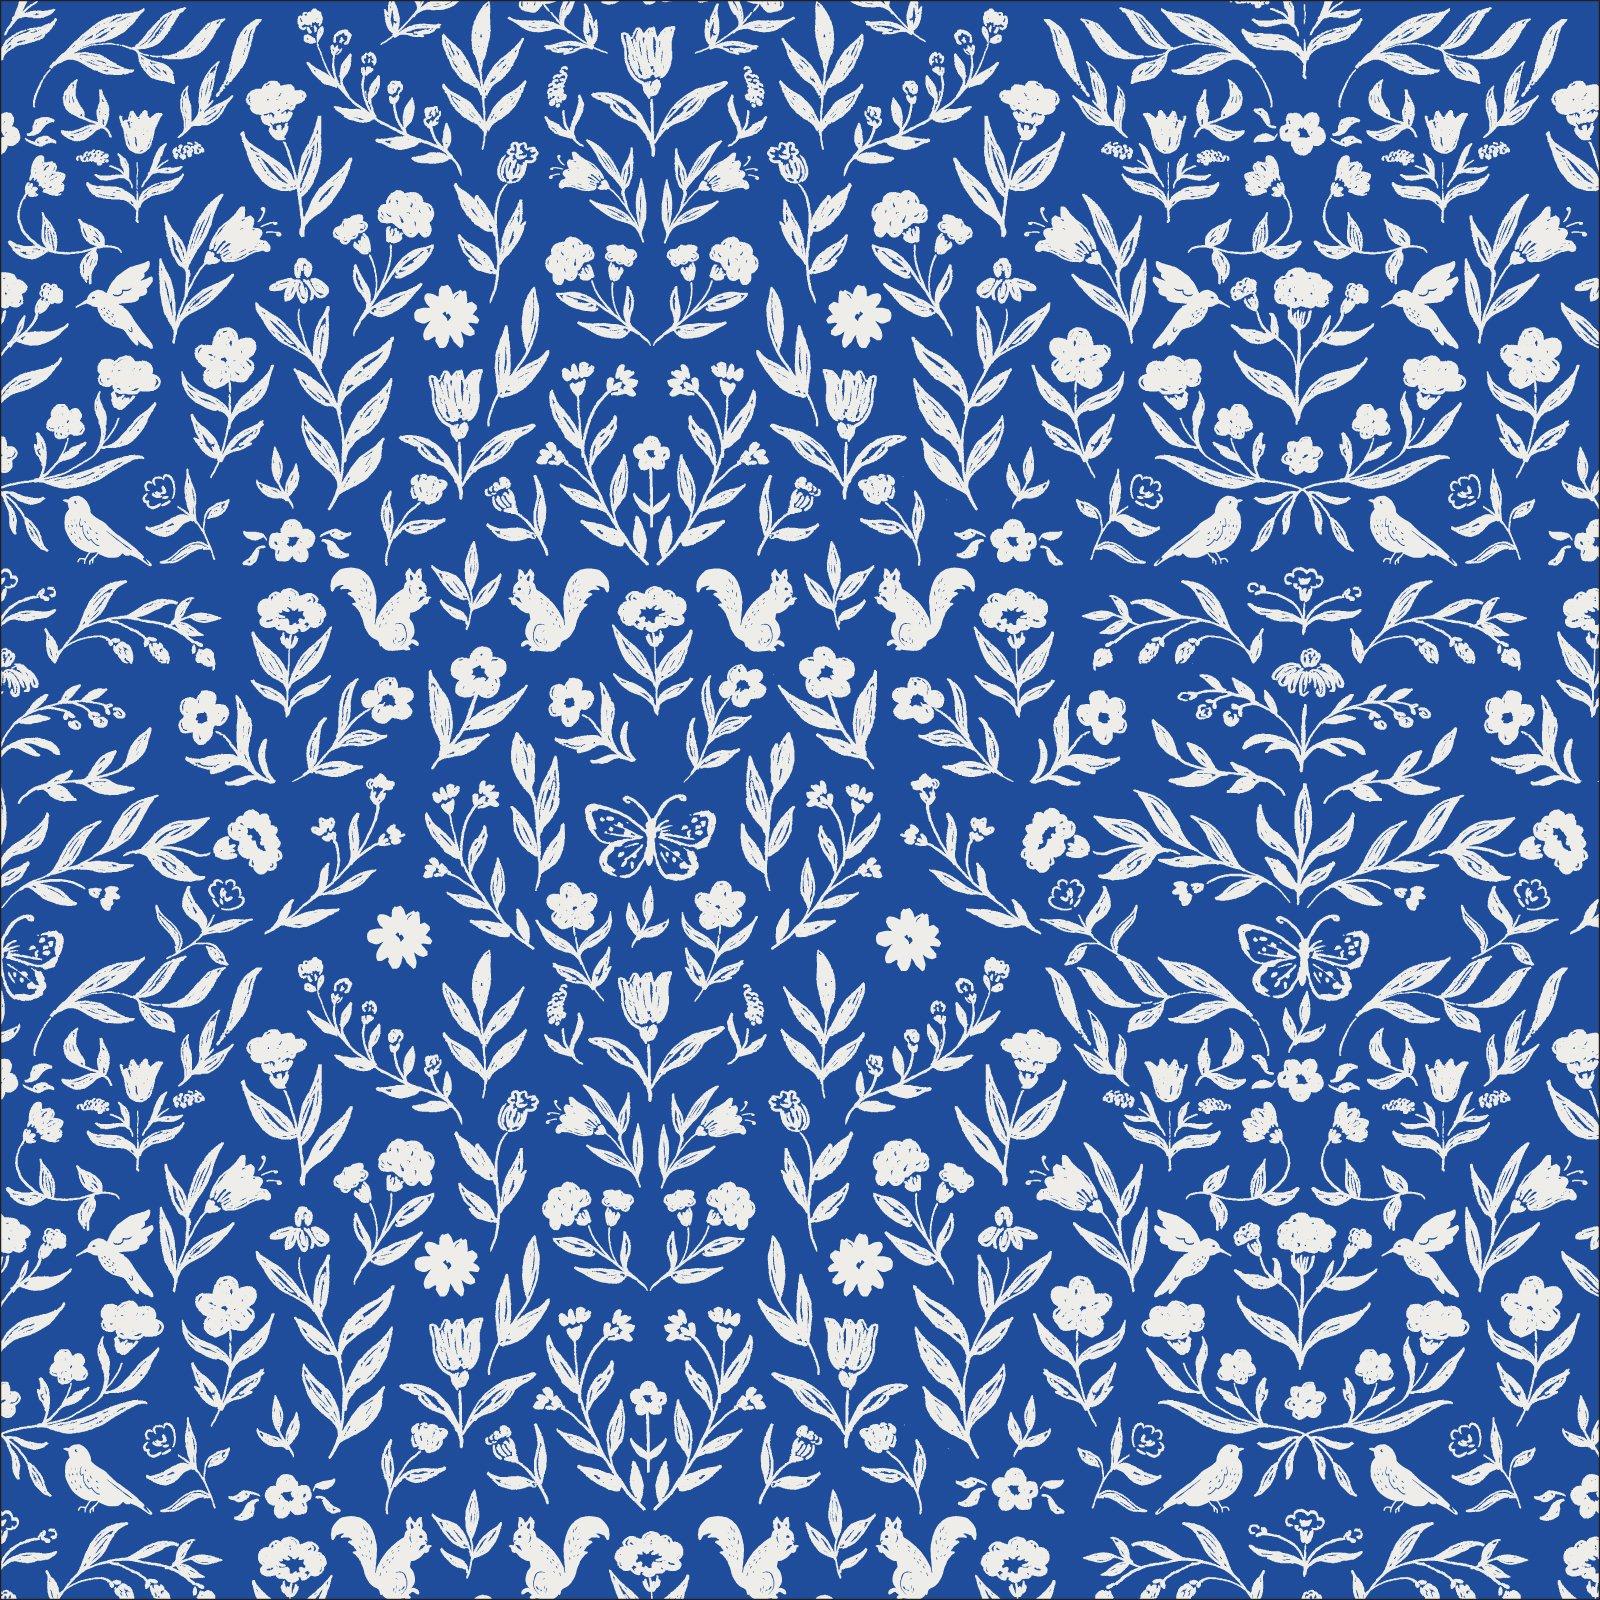 Heirloom - Perennial - Cloud 9 Organic Cotton